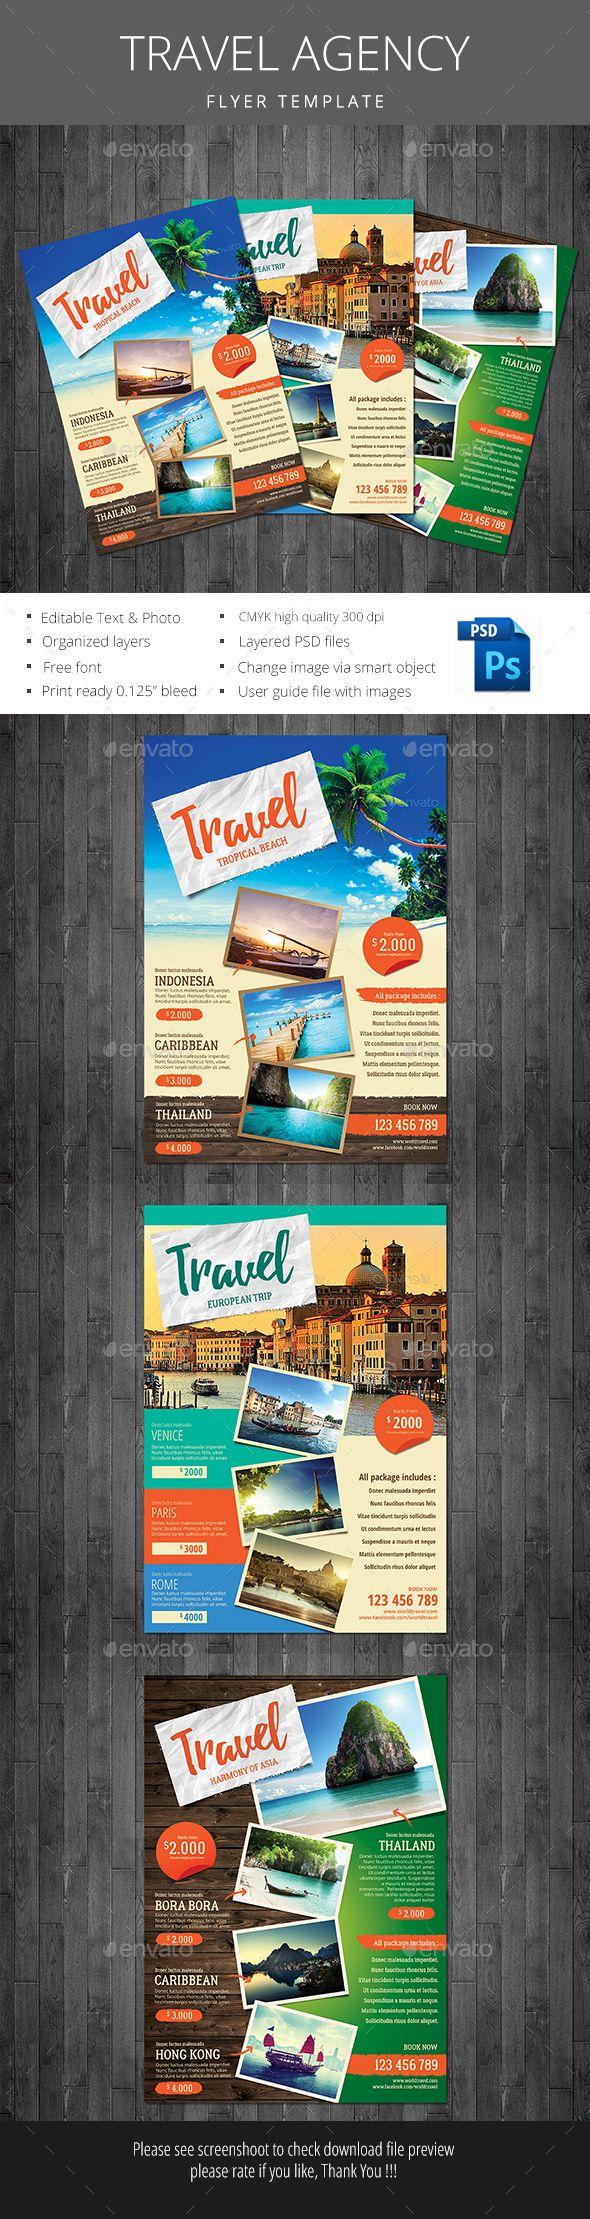 Travel Agency Flyer Template PSD. Download here: http://graphicriver.net/item/travel-agency-flyer/15993054?ref=ksioks